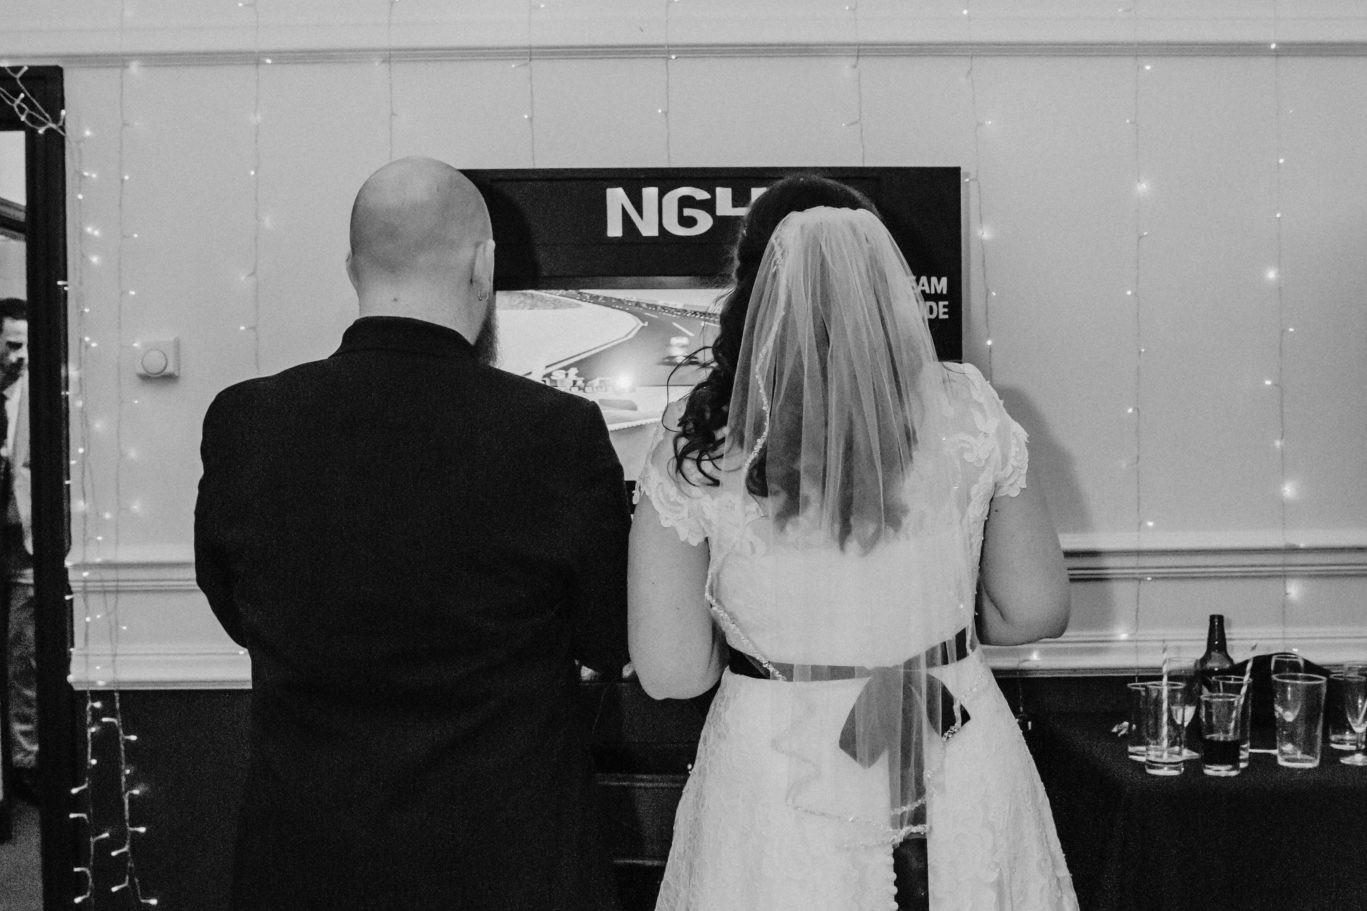 Wedding first dance at the Shenley Cricket club, Sarah and Sam playing NG4 playstaion gaming station